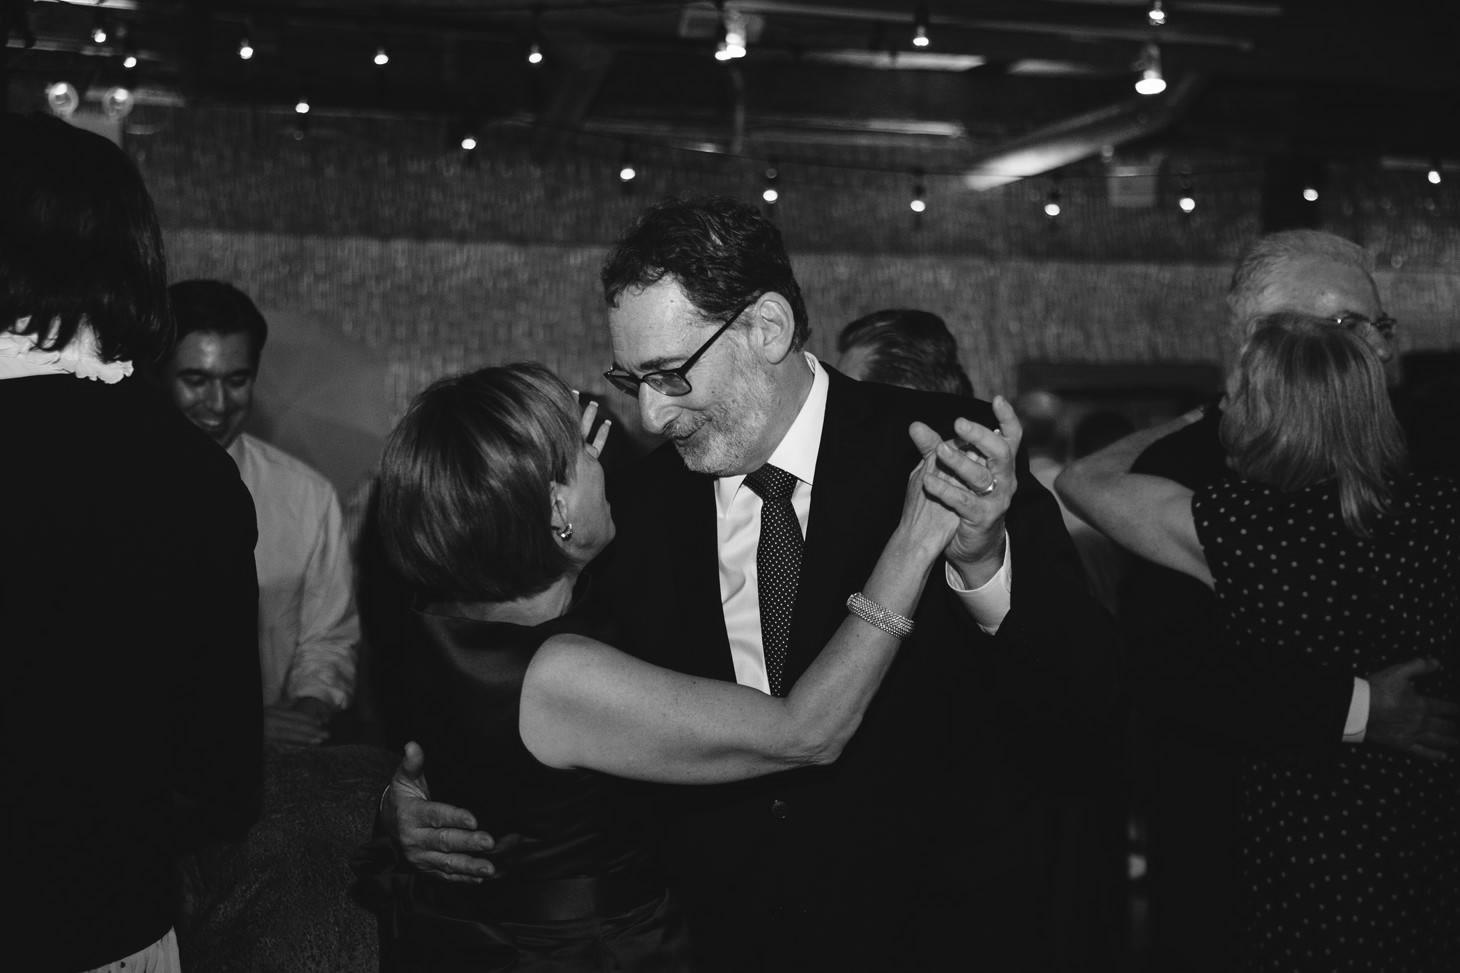 050-nyc-dumbo-loft-brooklyn-wedding-photographer-smitten-chickens-photo-.jpg